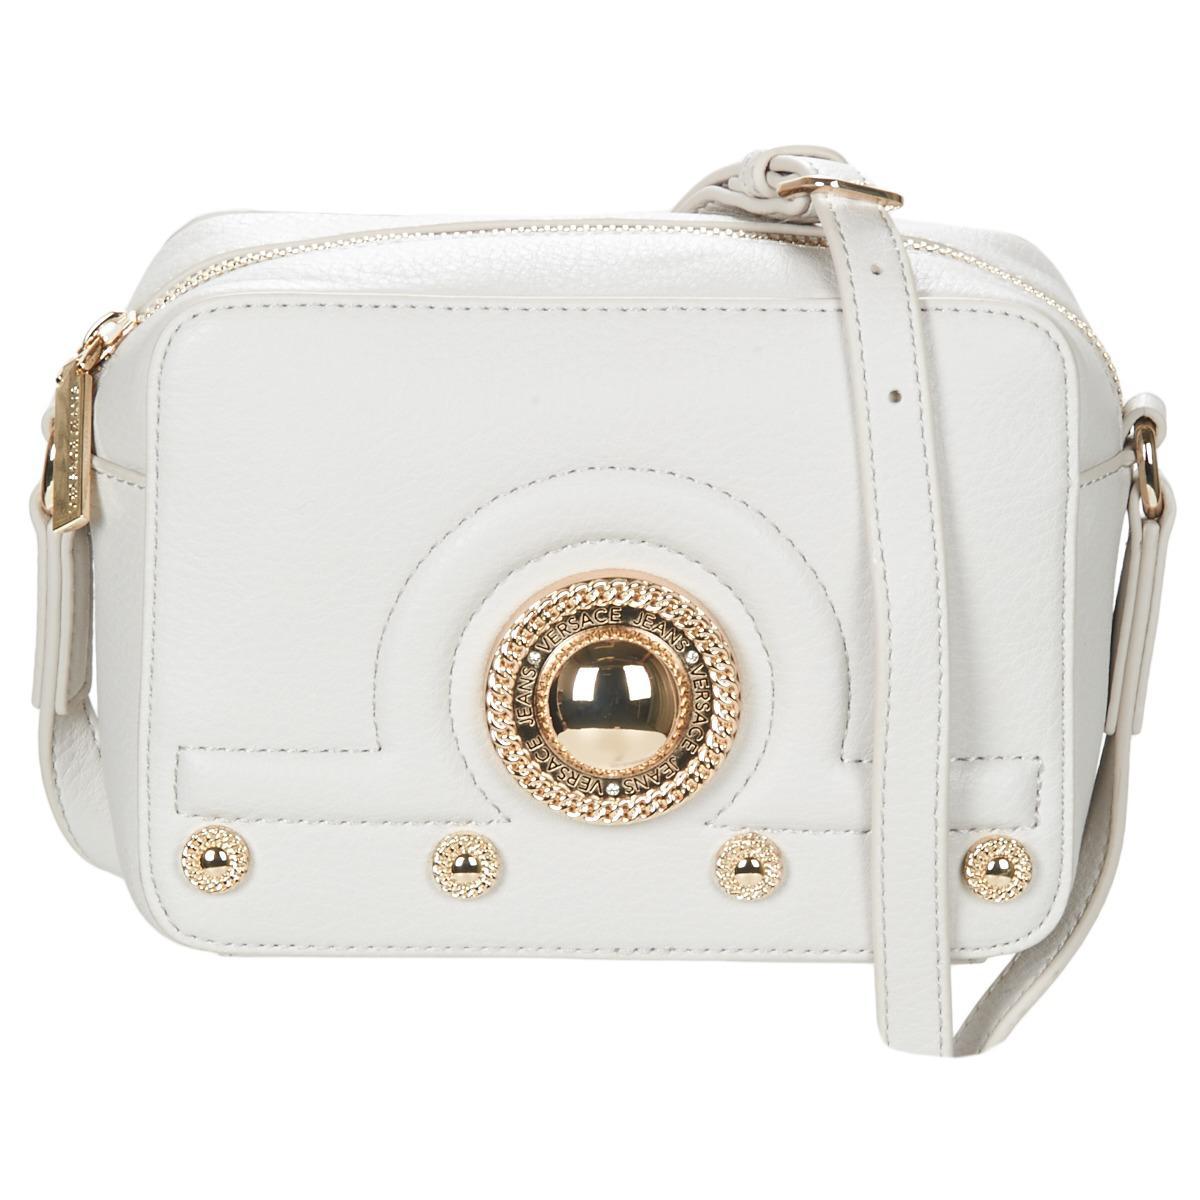 469f1921ce Versace Jeans Vrbbl4 Women's Shoulder Bag In White in White - Lyst